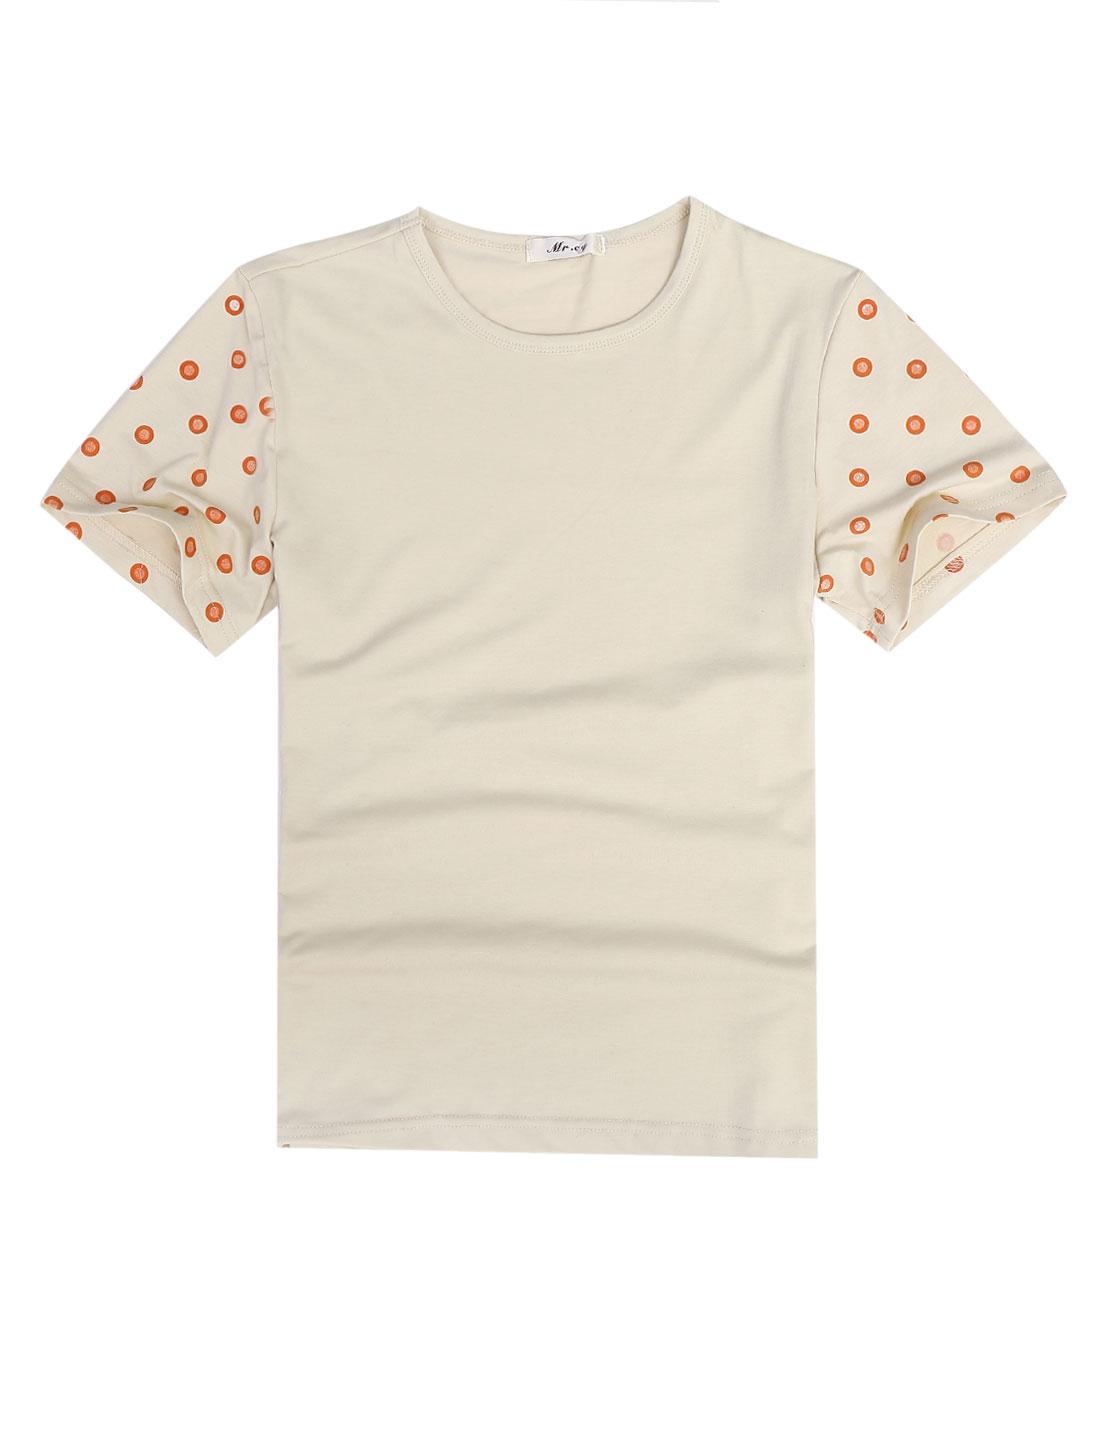 Man Dots Print Short Sleeve Pullover Casual Tee Shirt Khaki M